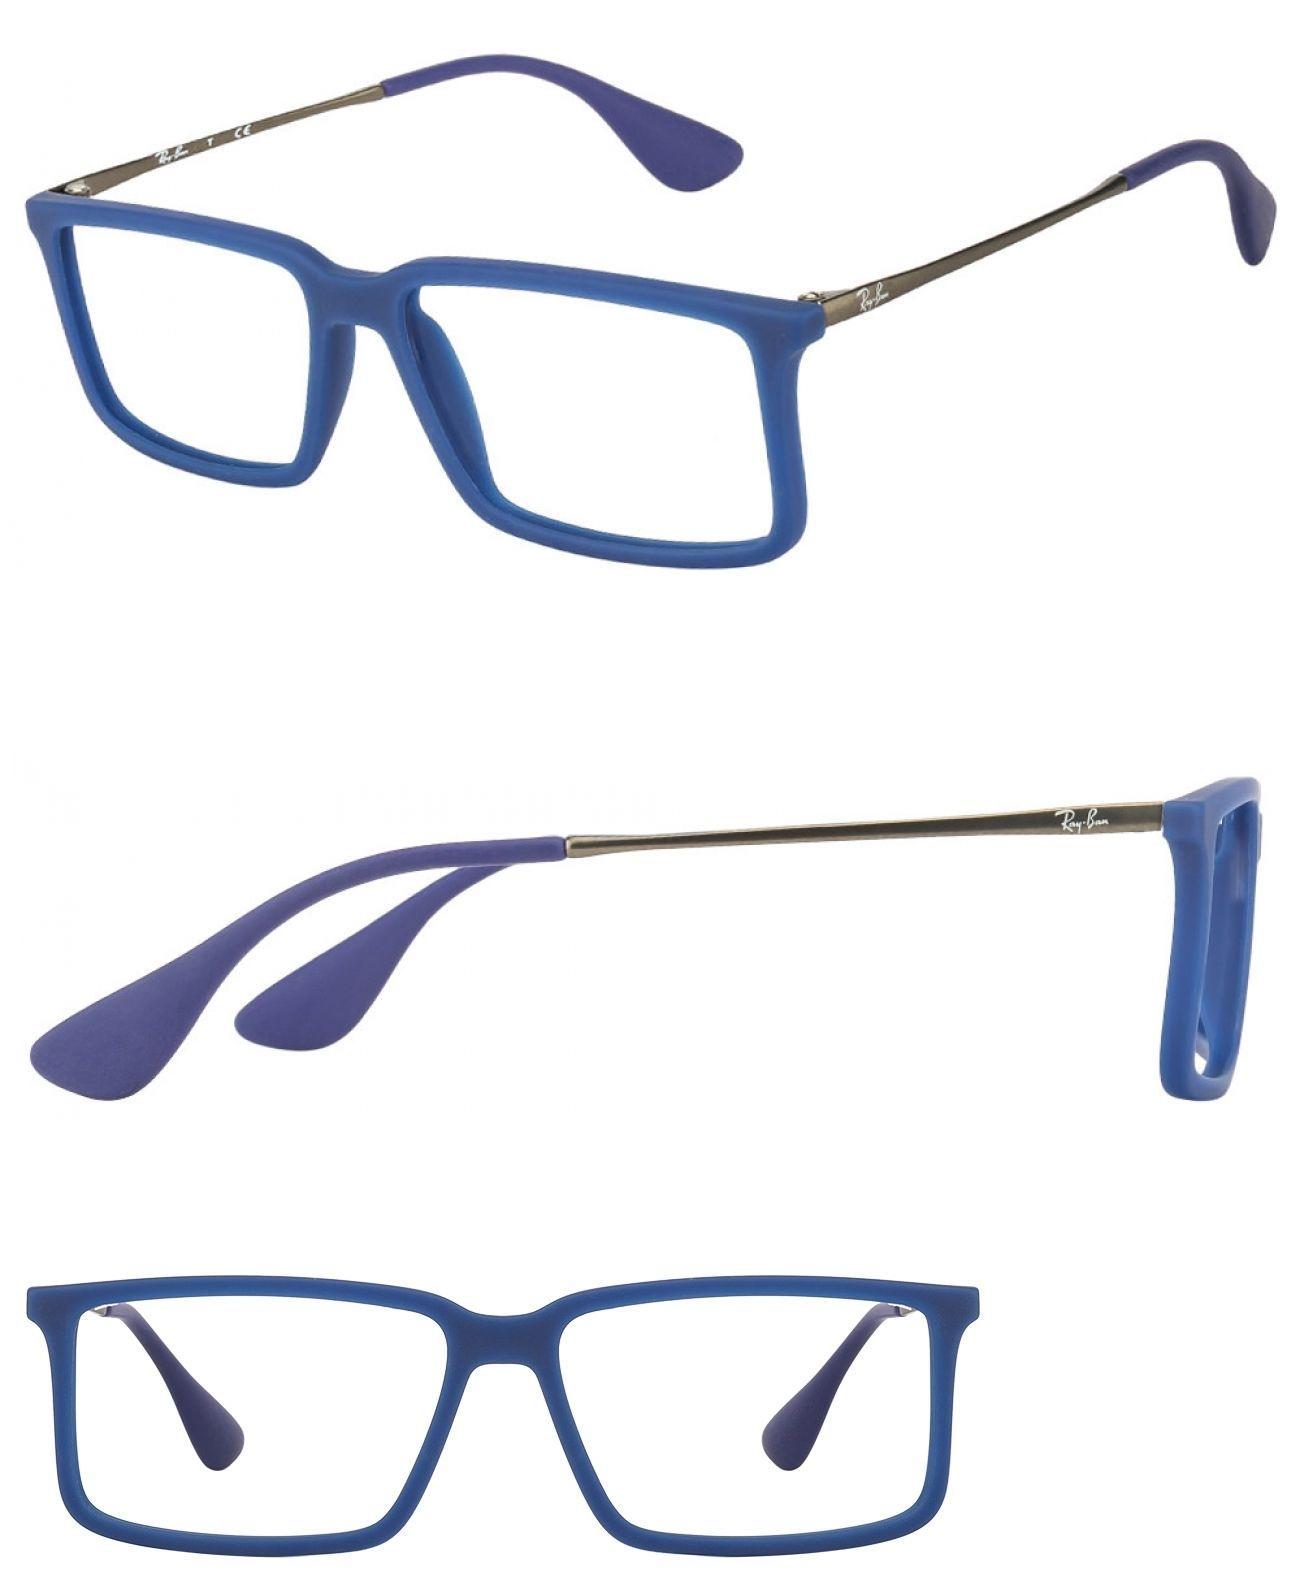 6764e9846316 ... cheap ray ban glasses frame ebay eyeglass frames 390 ray ban mens blue  bifocals eyeglasses frame ...